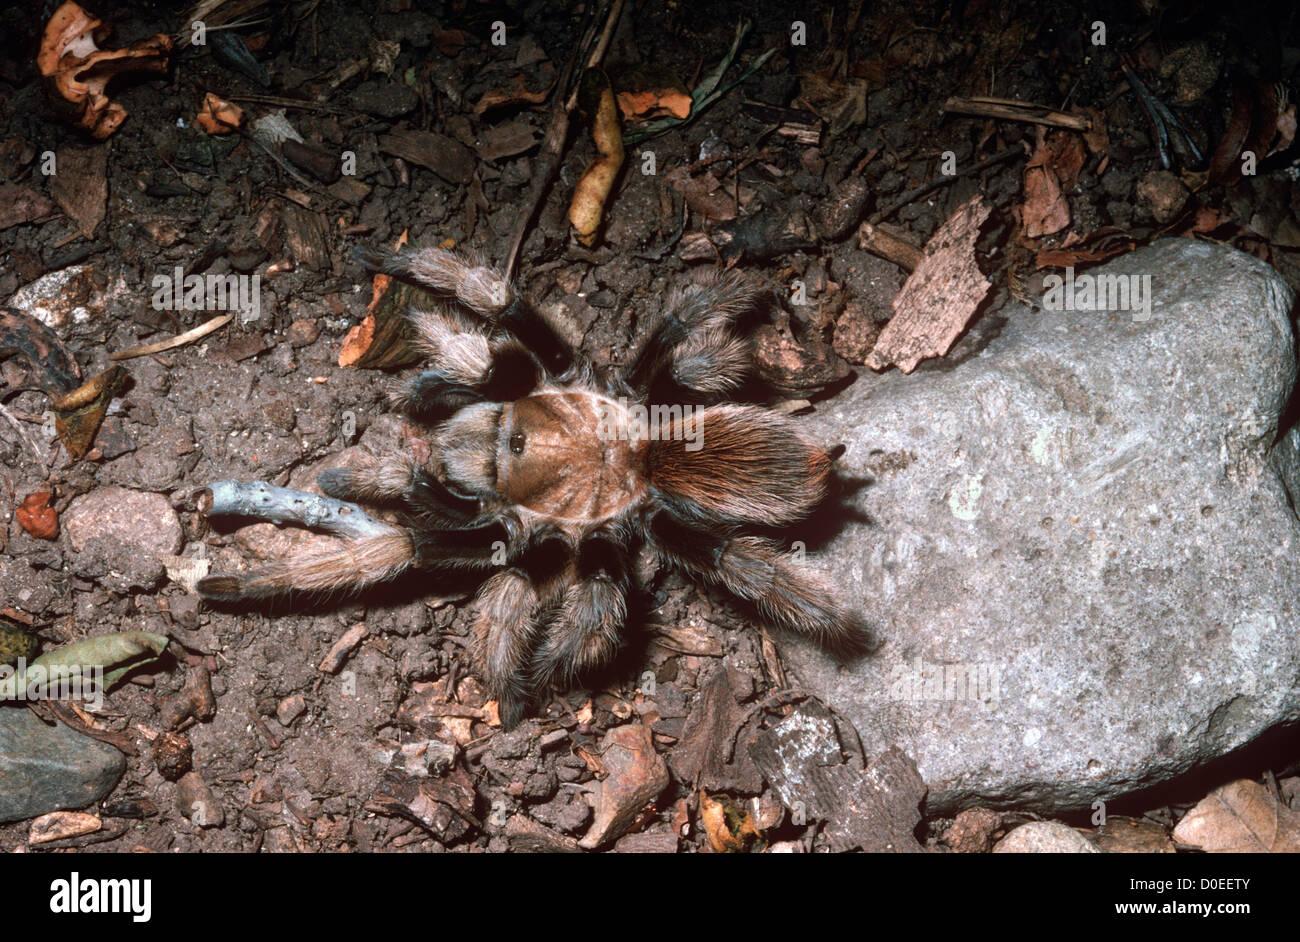 Western Desert Tarantula Spider Aphonopelma Chalcodes Female Stock Photo Alamy